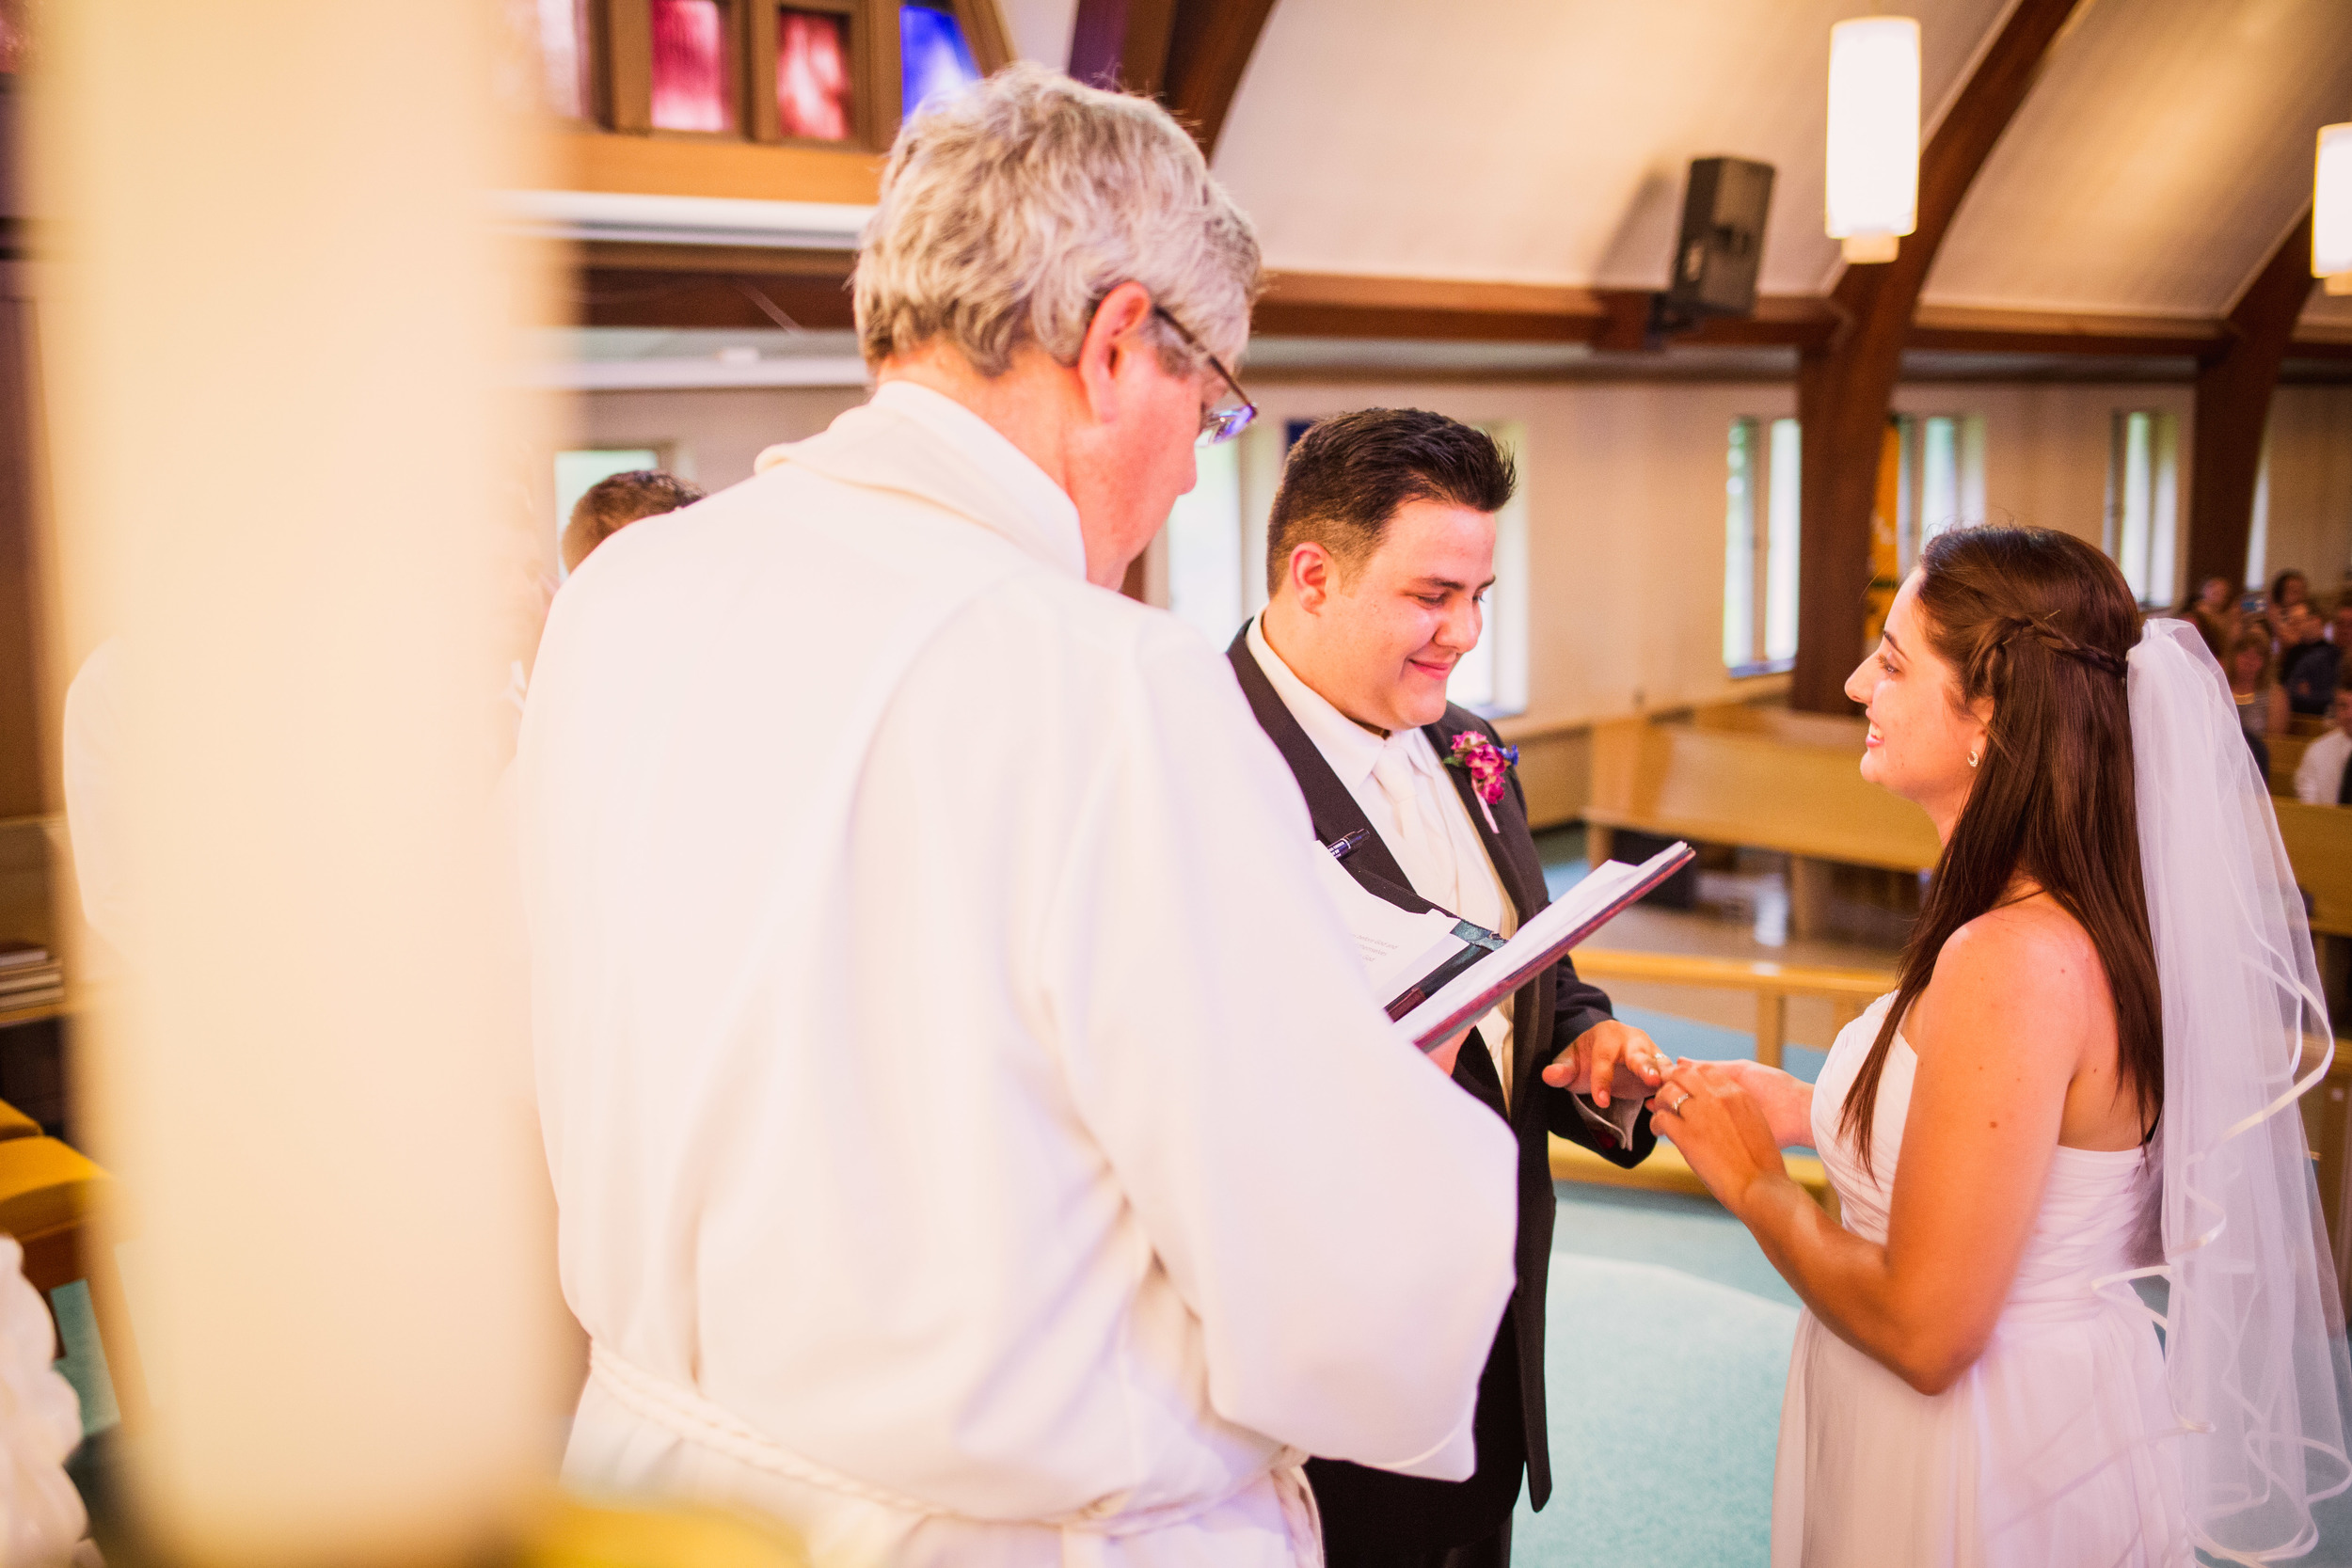 Stephanie-and-Mitchell-Buffalo-NY-Wedding-Stefan-Ludwig-Photography-157.jpg